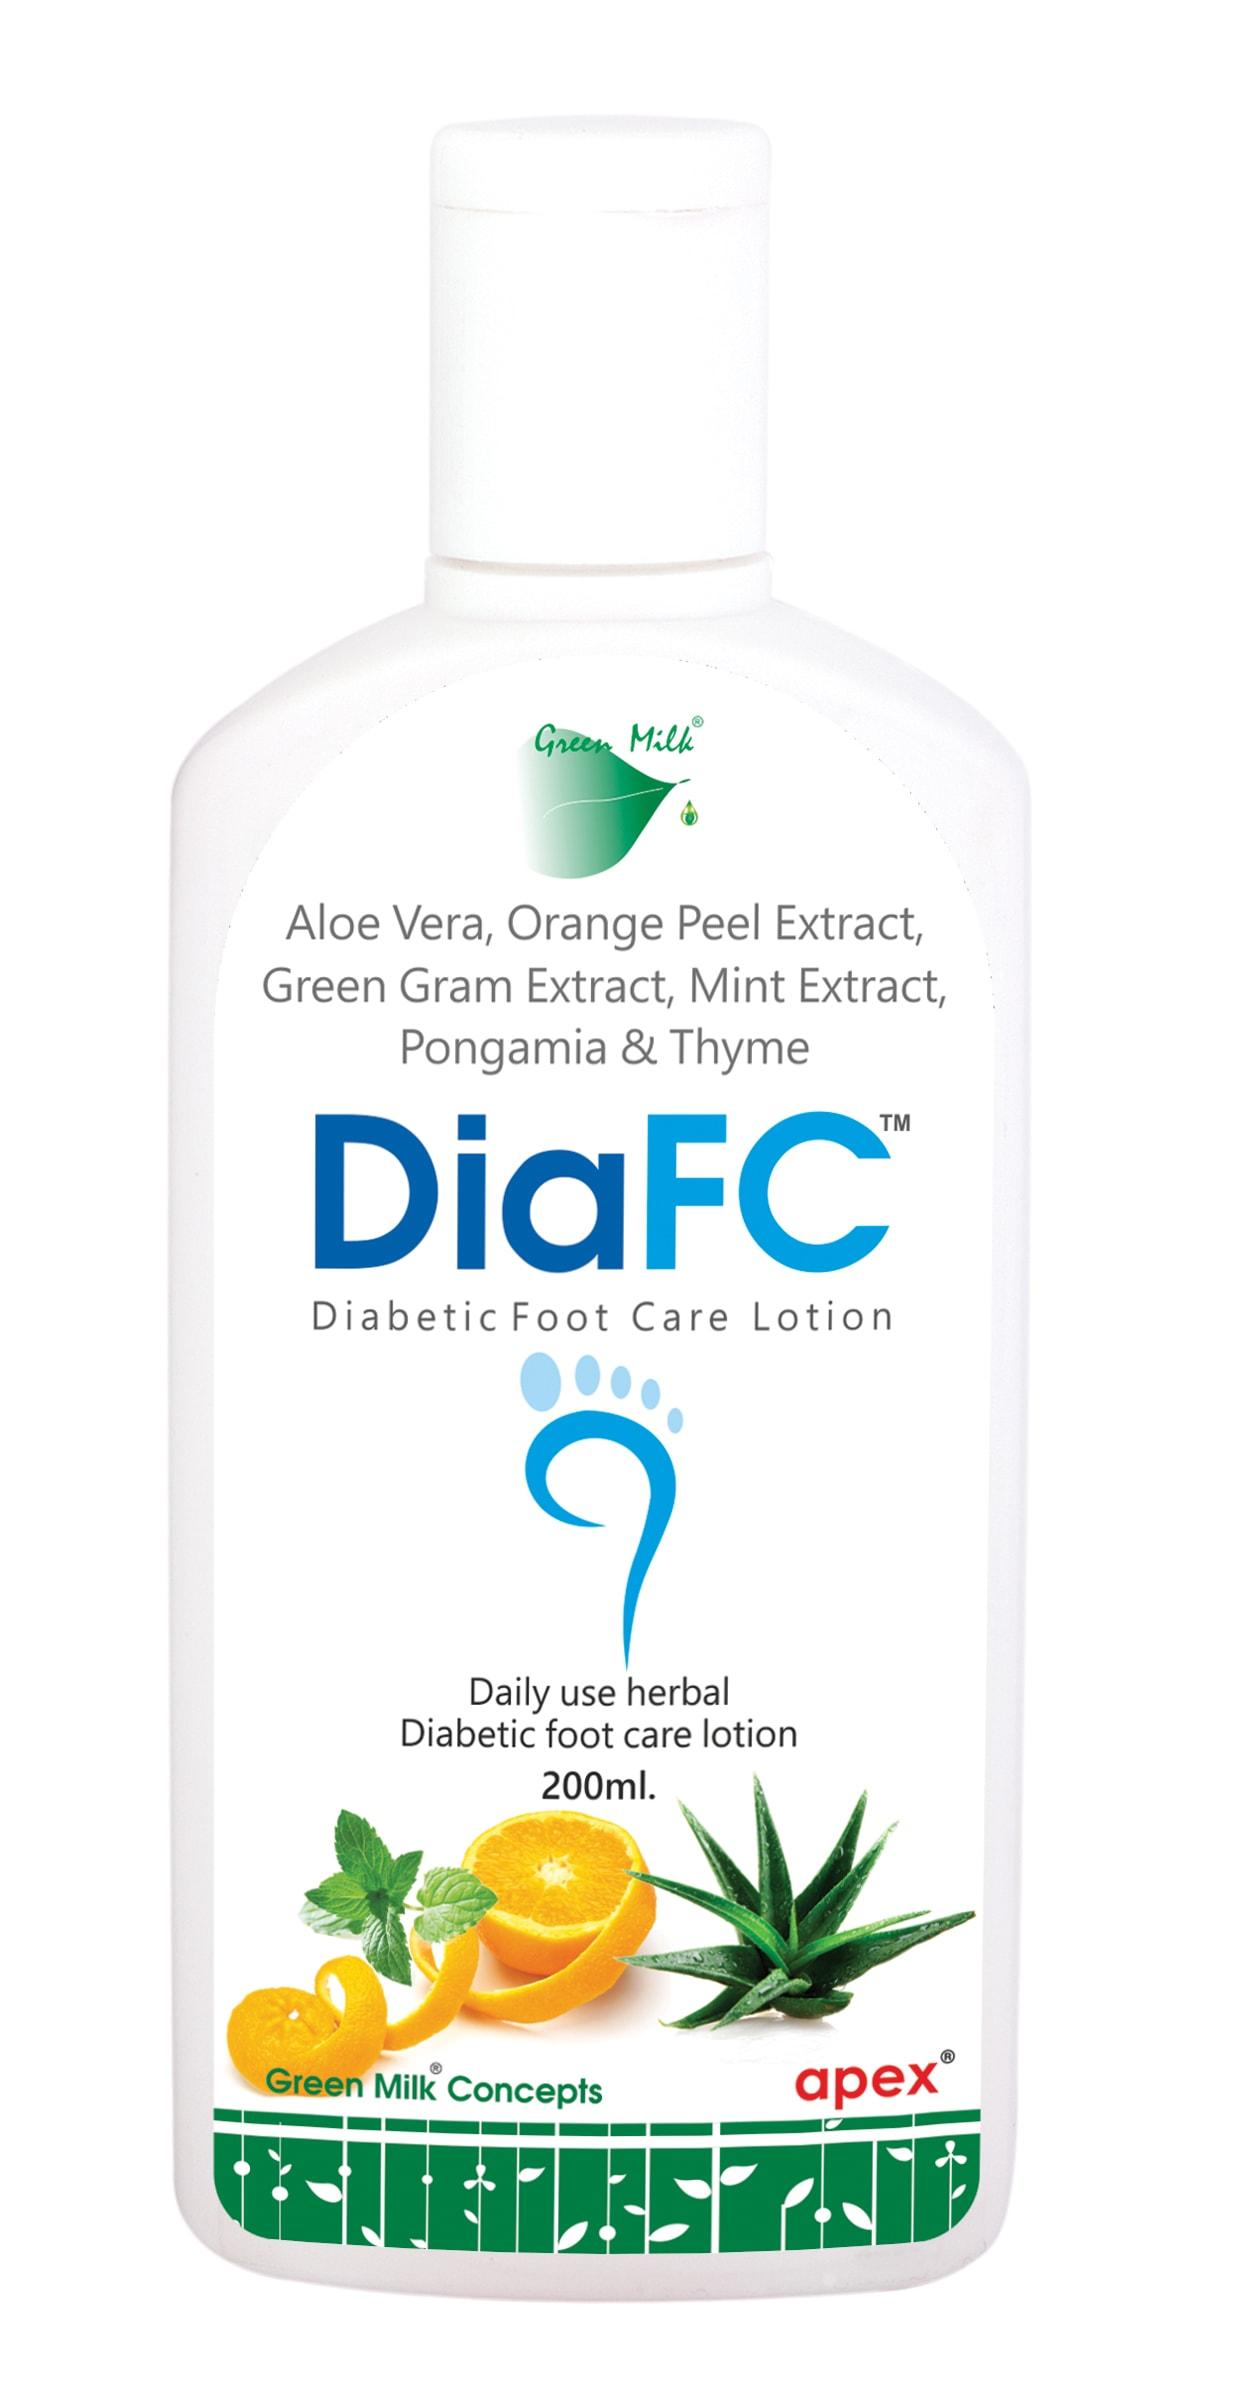 Diafc Lotion